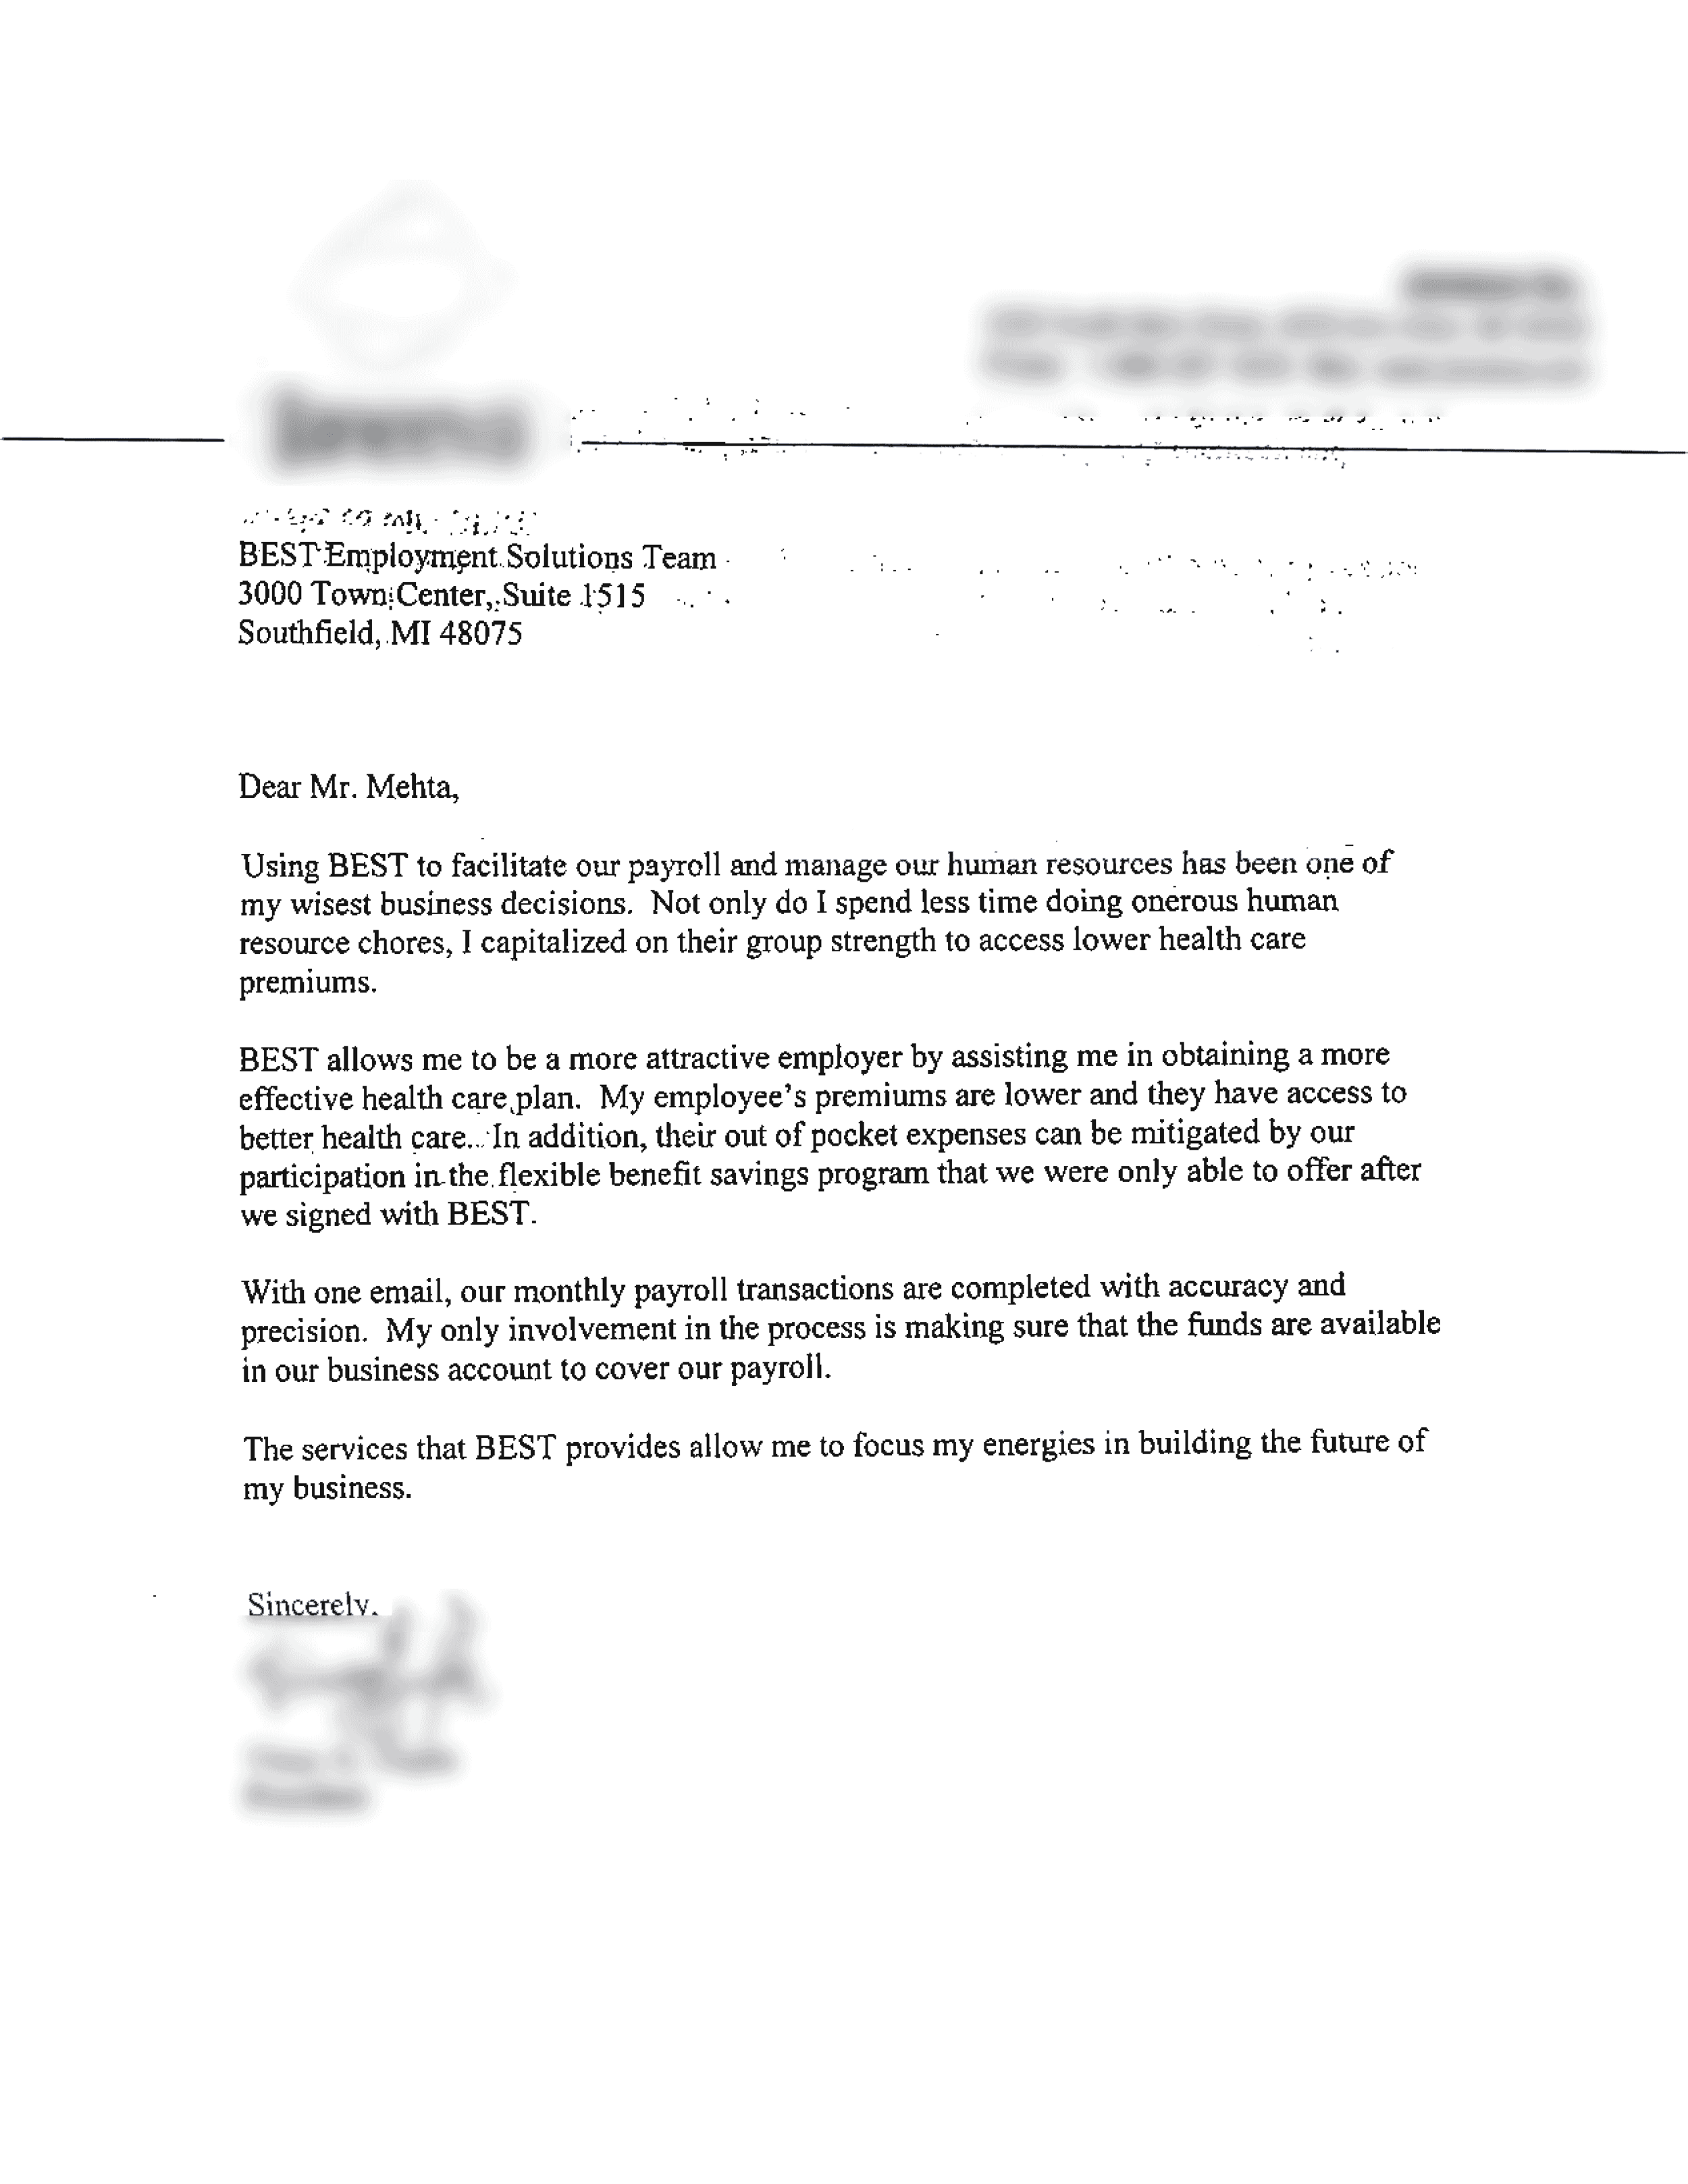 Janeeva-Signed-Reference-Letter.png